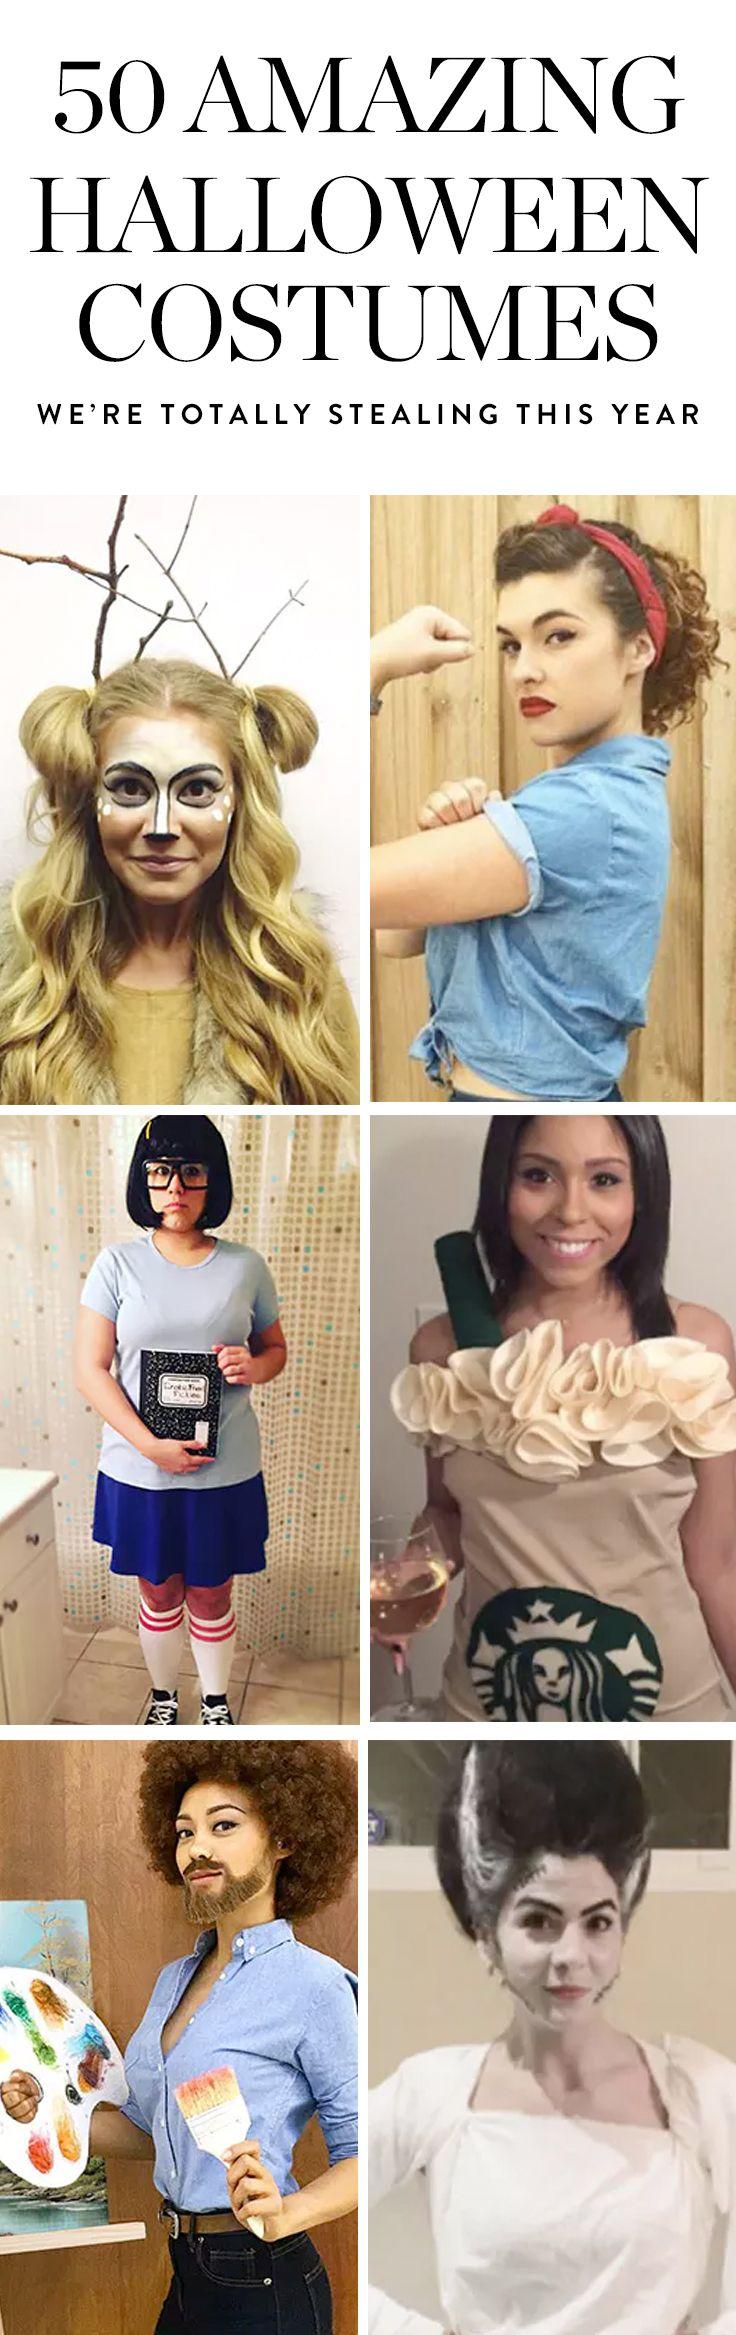 best 25+ most creative halloween costumes ideas on pinterest